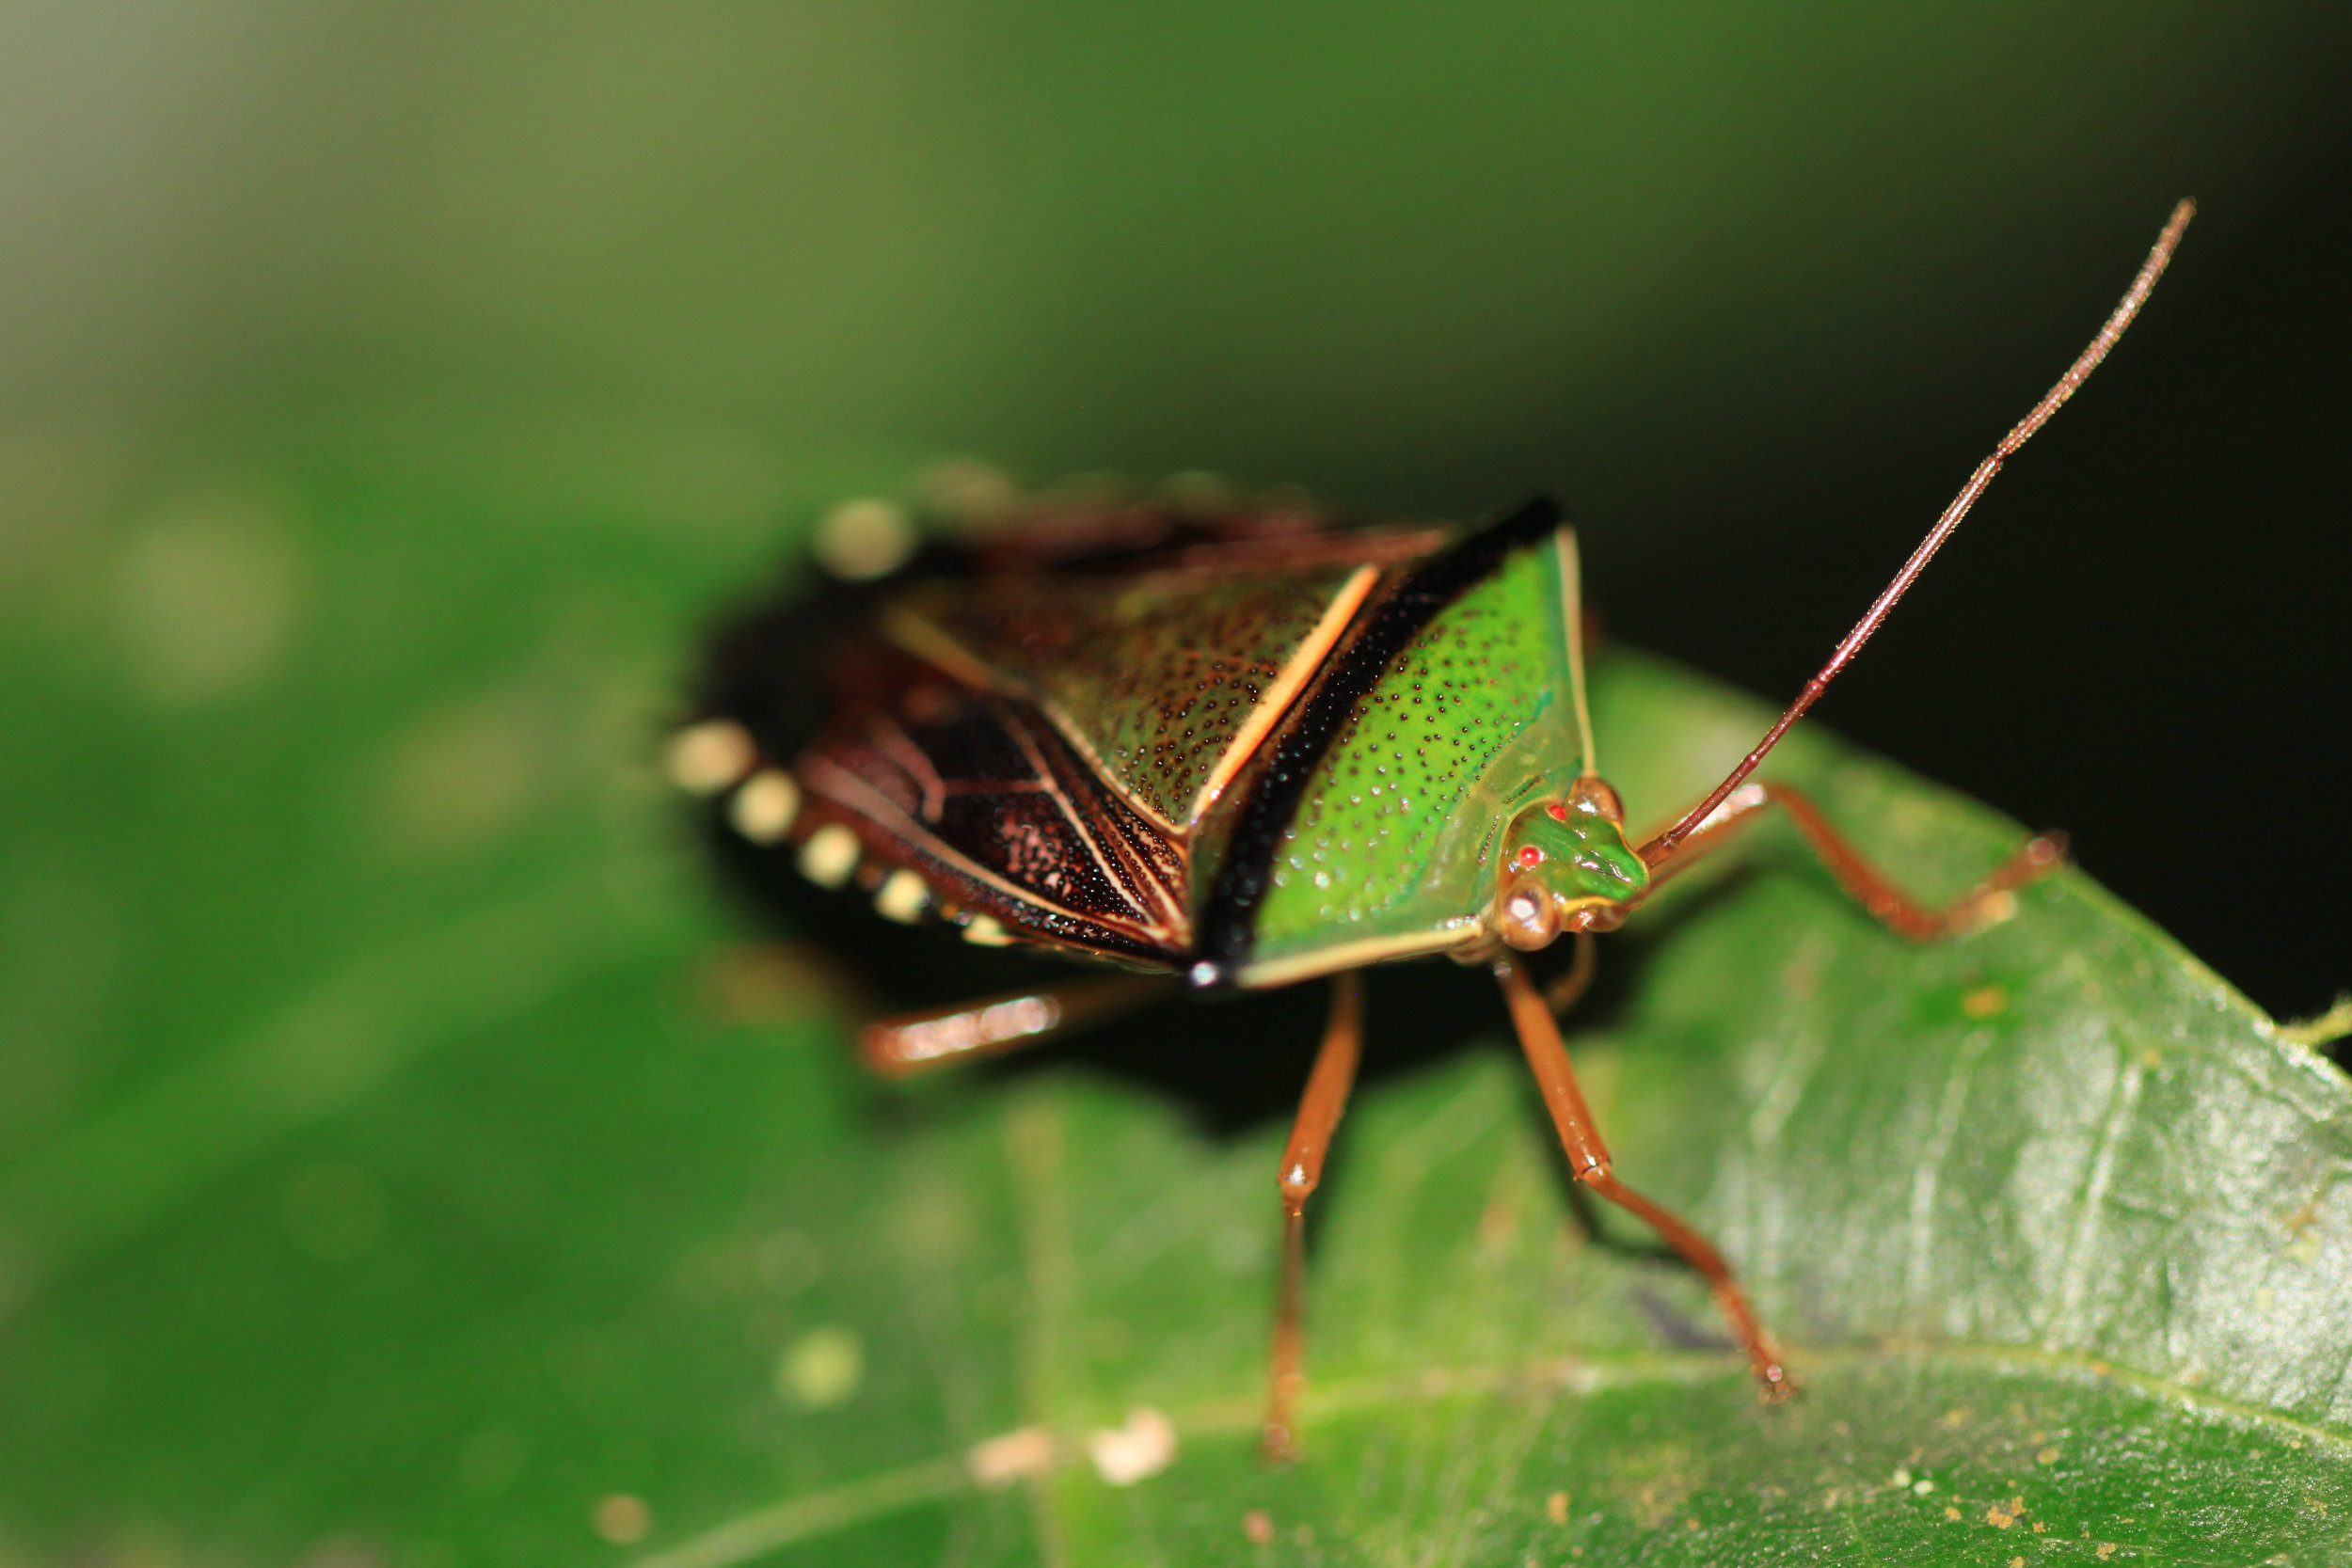 Stink bug at night in the Pentatomidae family. Manuel Antonio, Costa Rica.